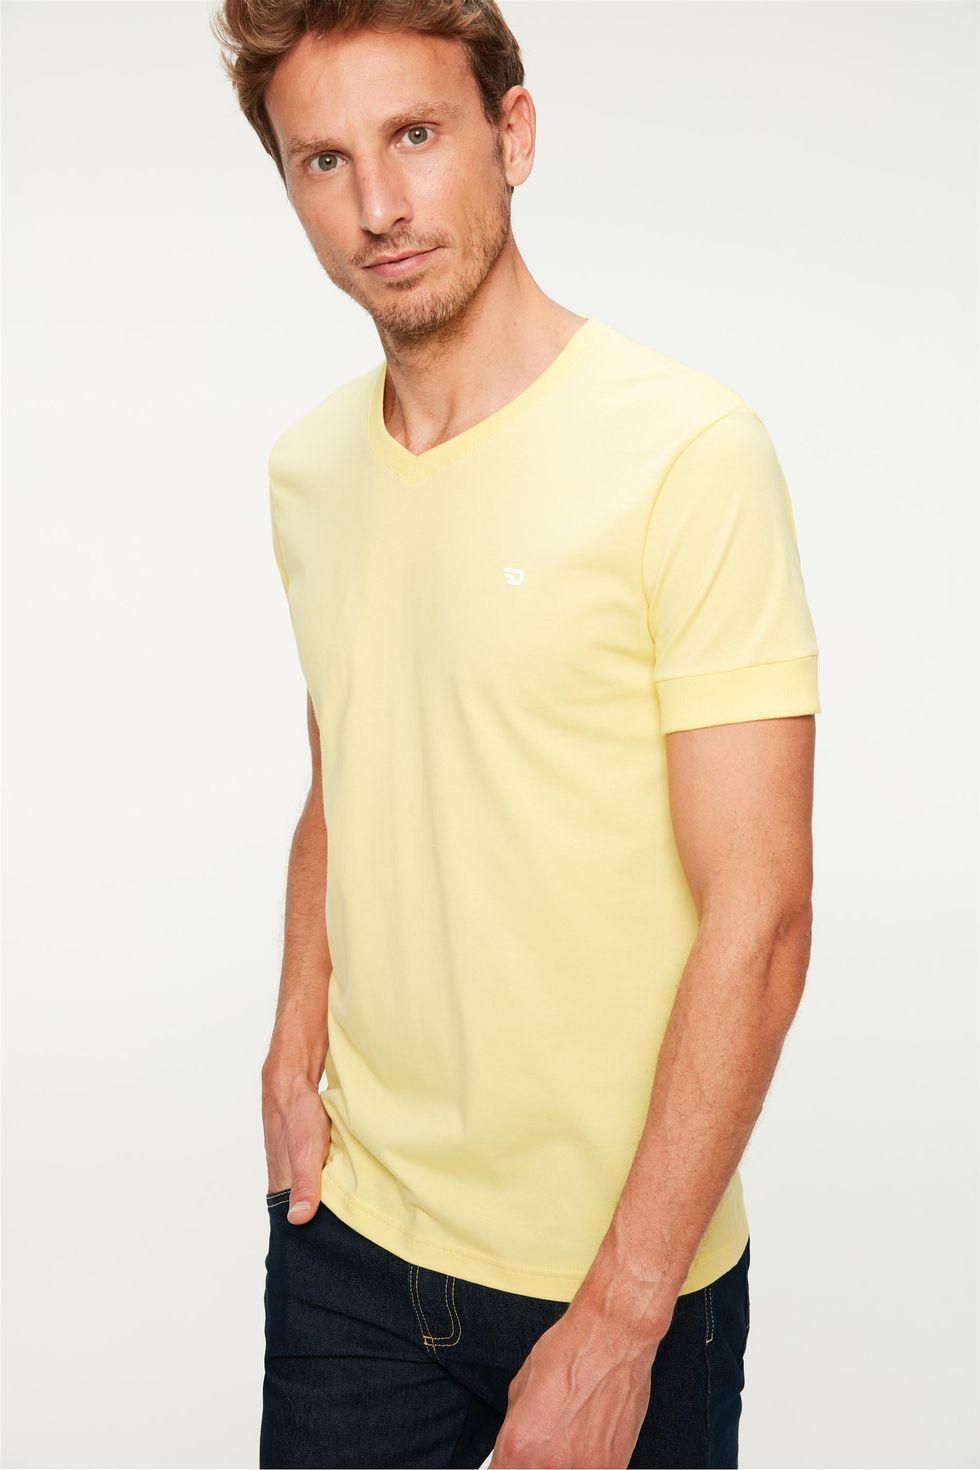 Camiseta College Gola V Masculina Tam: G / Cor: AMARELO CLARO